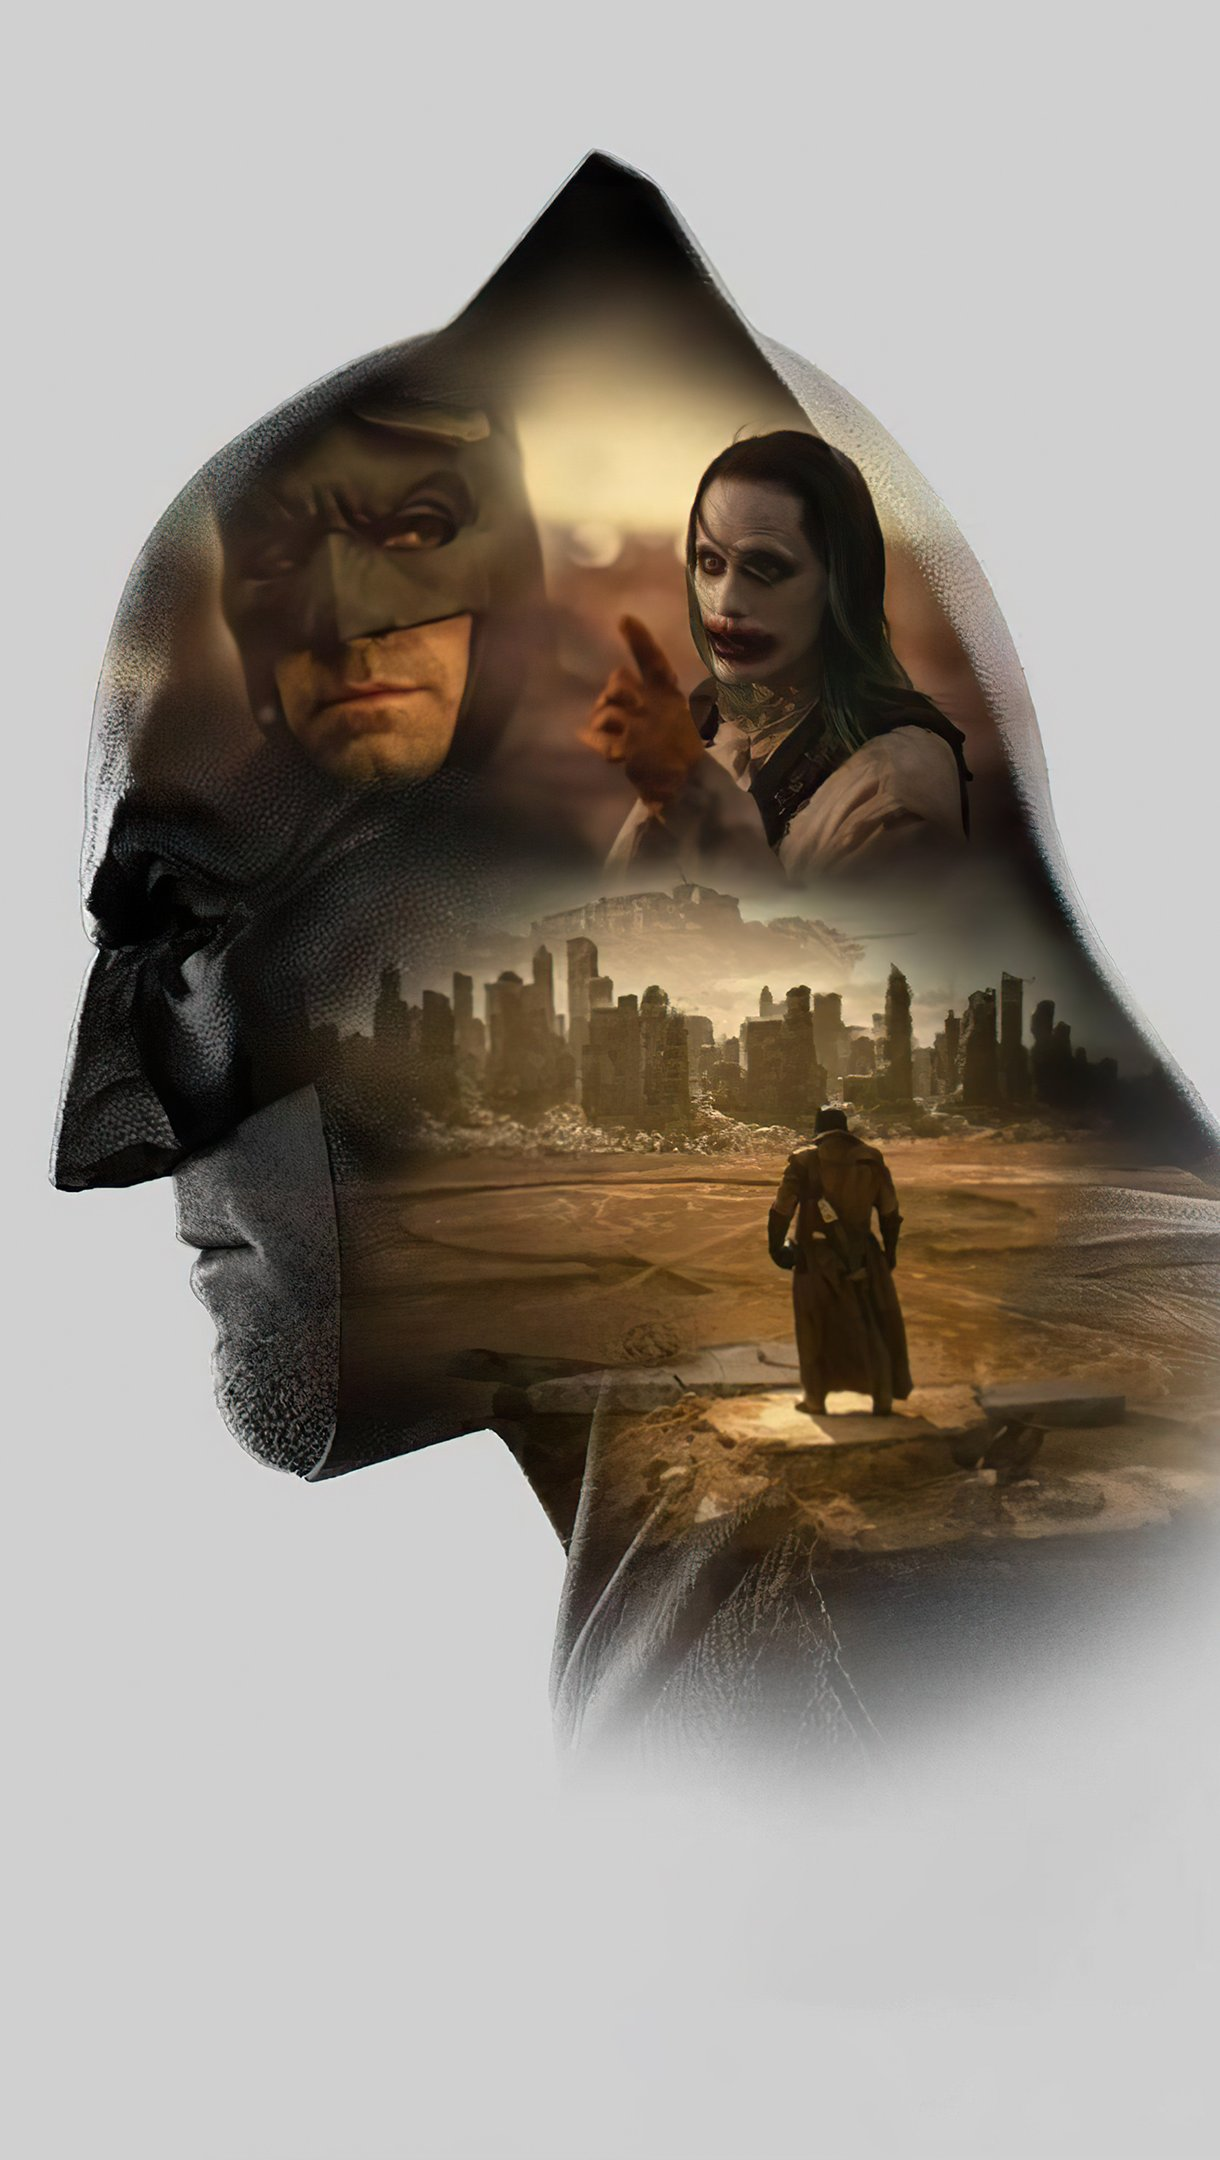 Fondos de pantalla Ben Affleck como Batman Zack Snyder's Liga de la justicia Minimalista Vertical